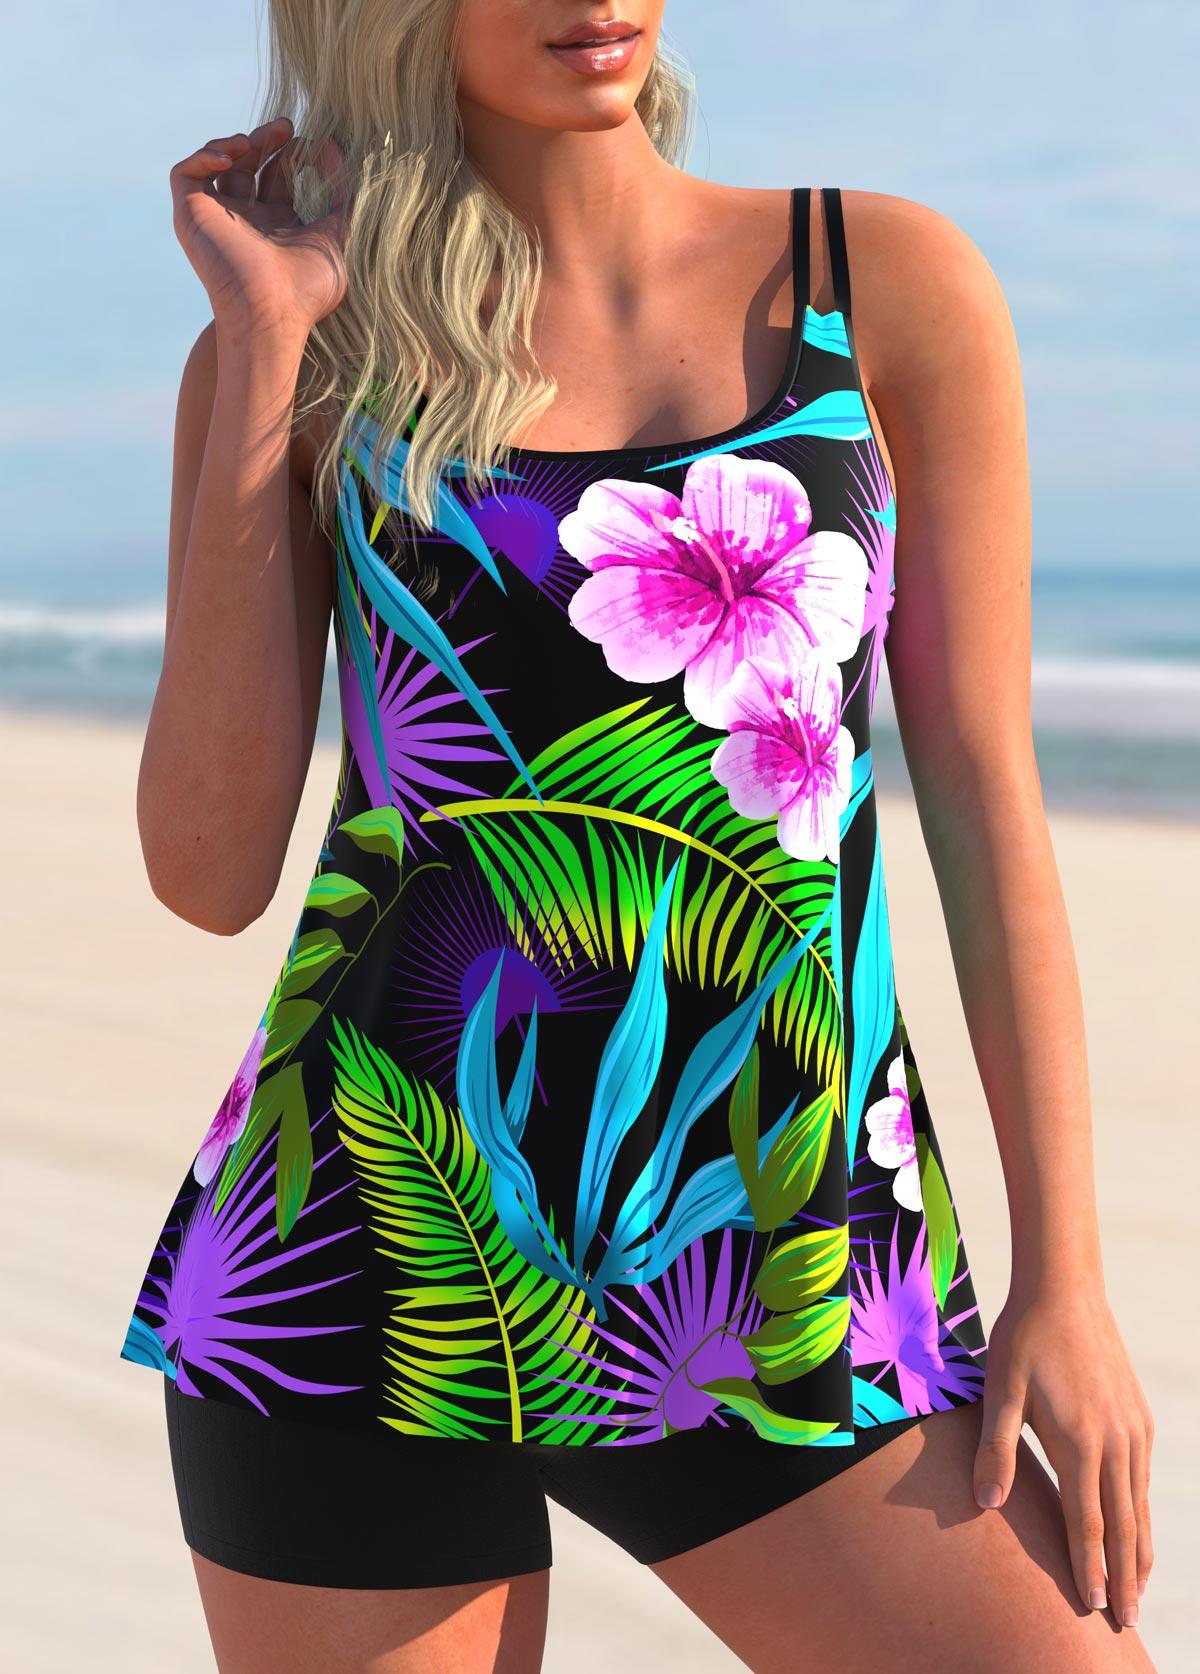 Floral and Leaf Print Tankini Set